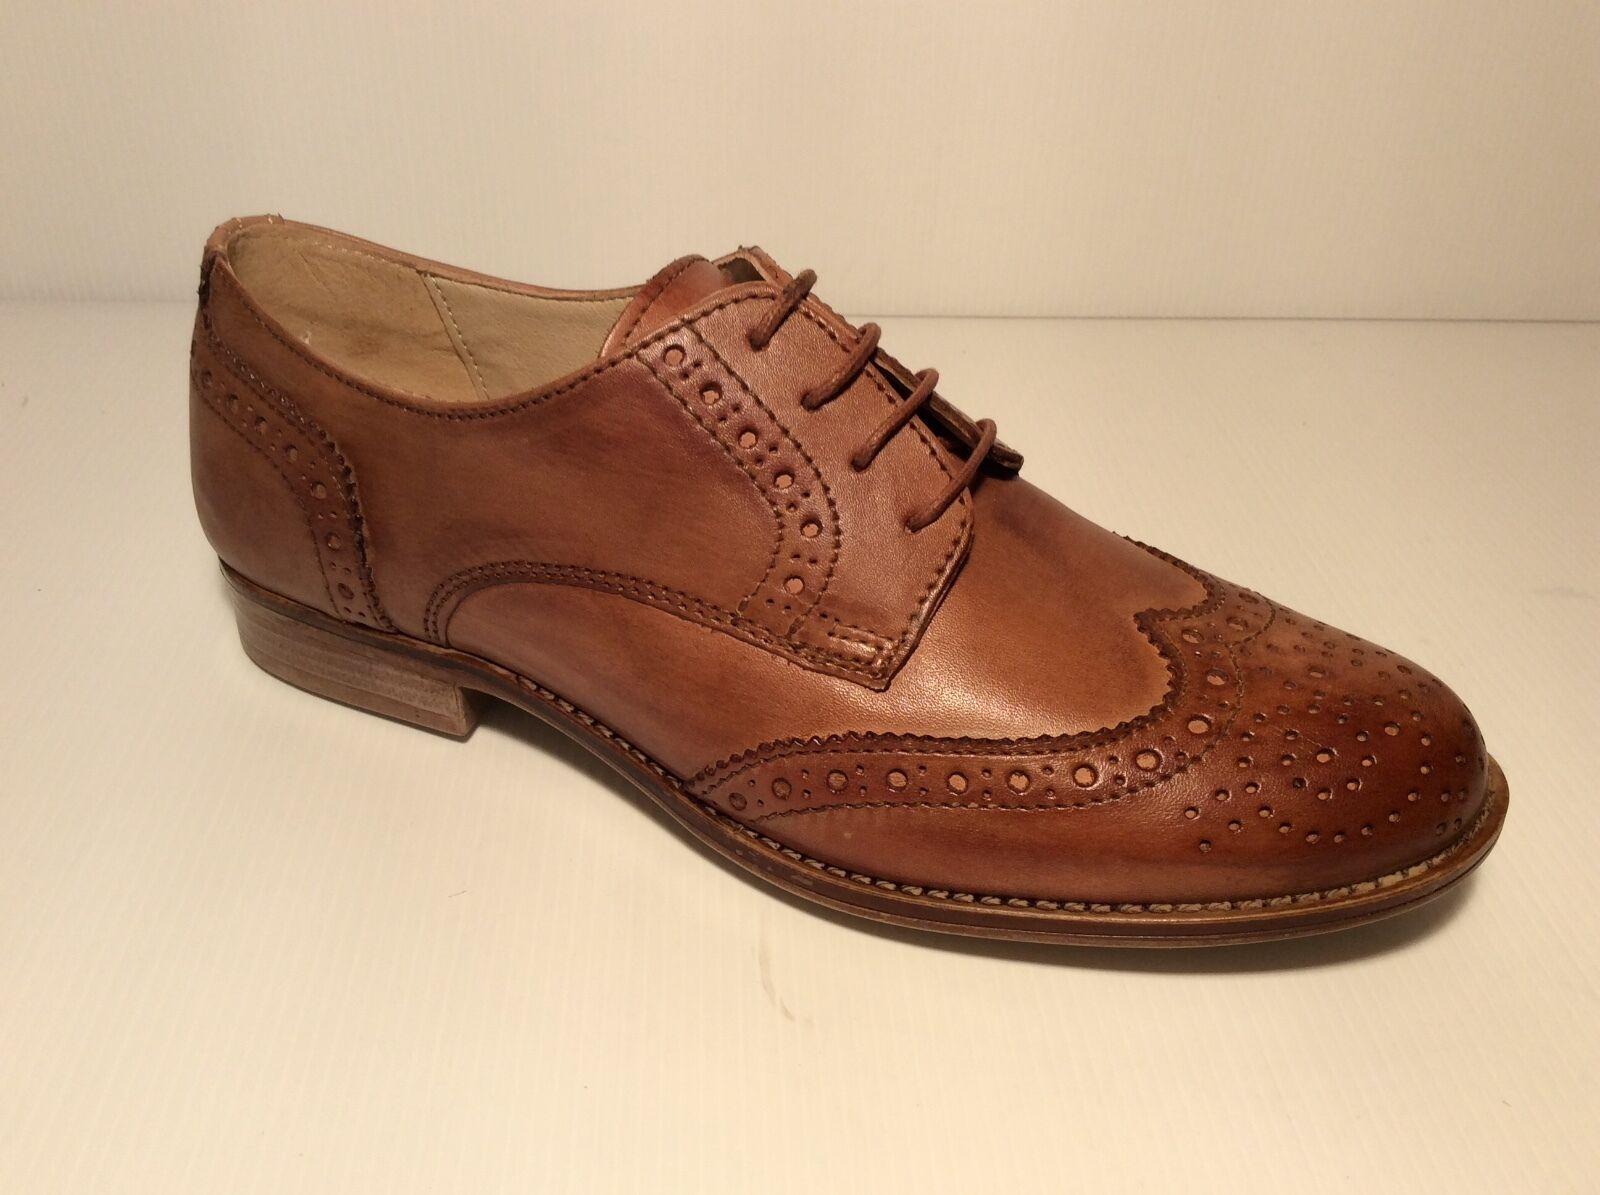 Schuhe Damenschuhe francesine moda vera pelle ELLEN BLAKE 1111 col cognac